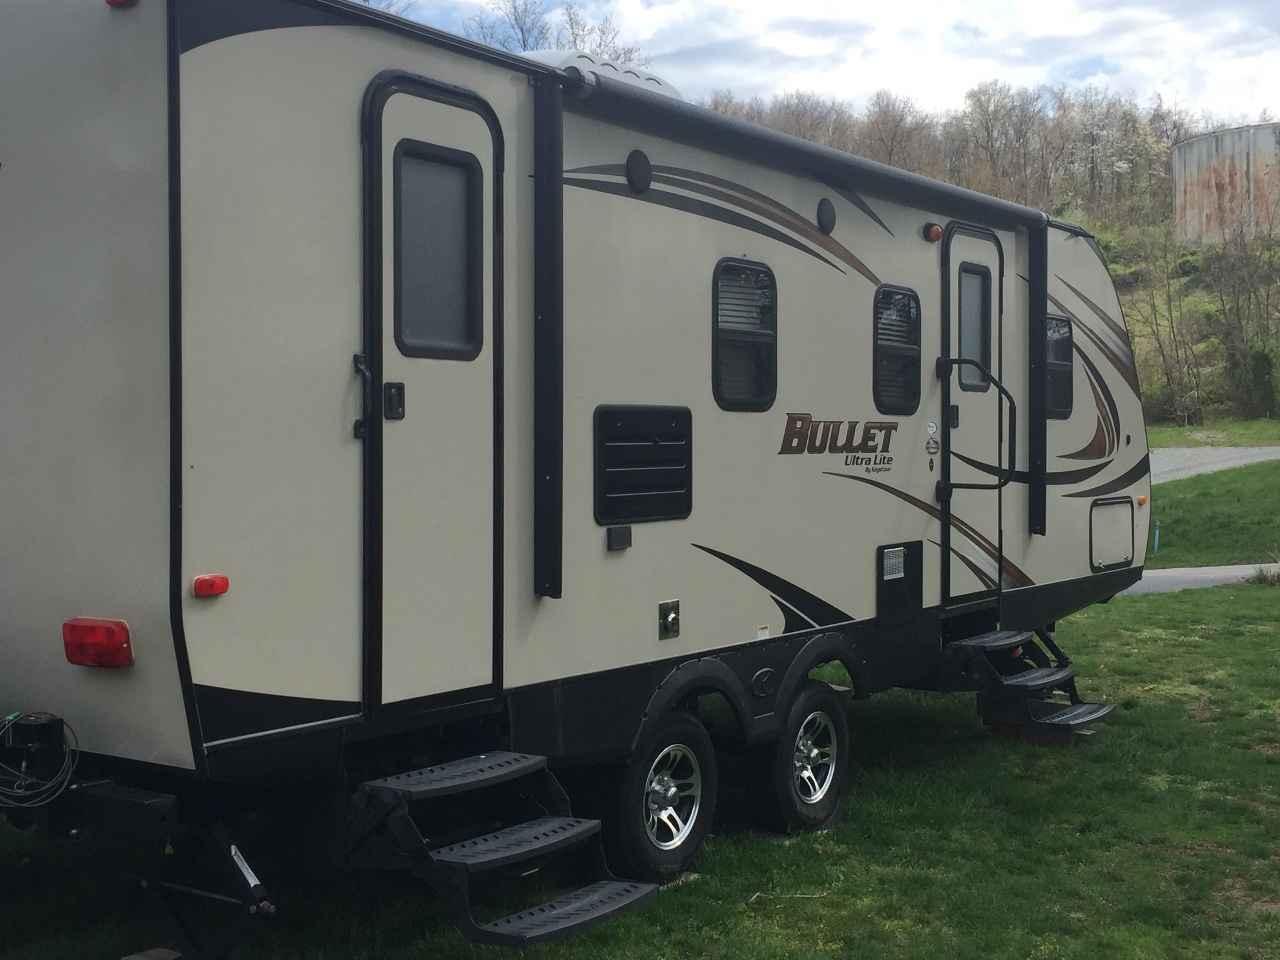 2014 used keystone bullet ultra lite travel trailer in pennsylvania pa. Black Bedroom Furniture Sets. Home Design Ideas